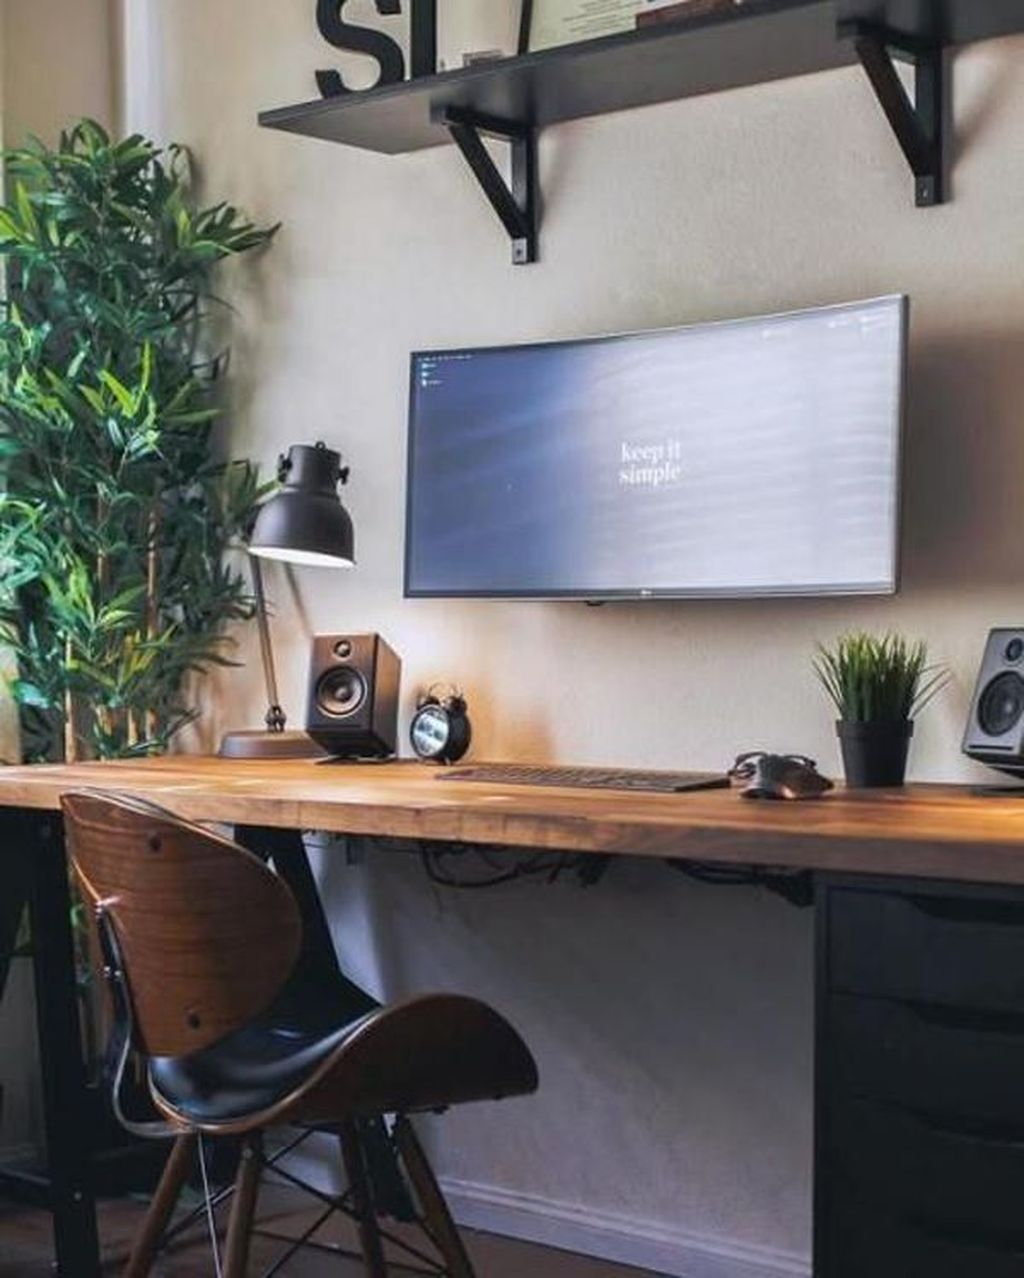 30 Admirable Modern Home Office Design Ideas That You Like Pimphomee Home Office Setup Home Office Design Office Interior Design